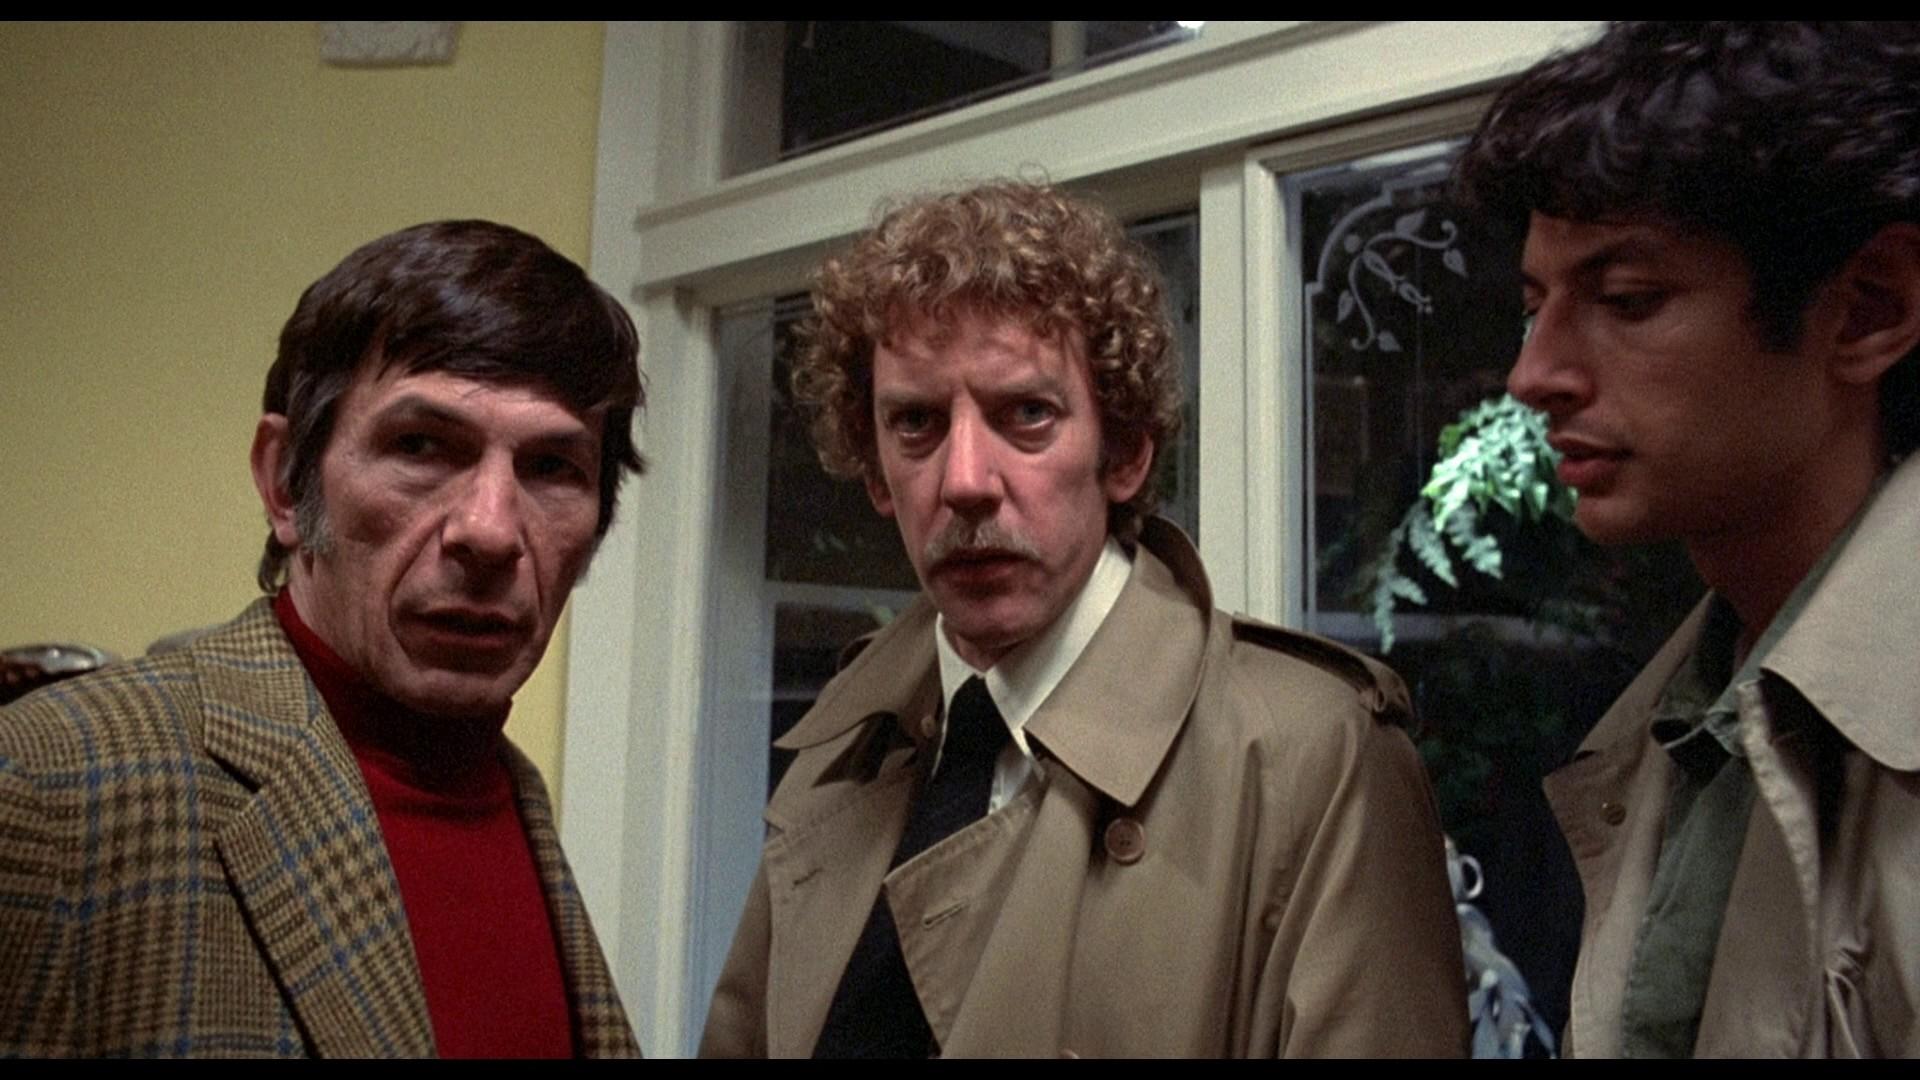 invasion-of-the-body-snatchers-1978-cast.jpg